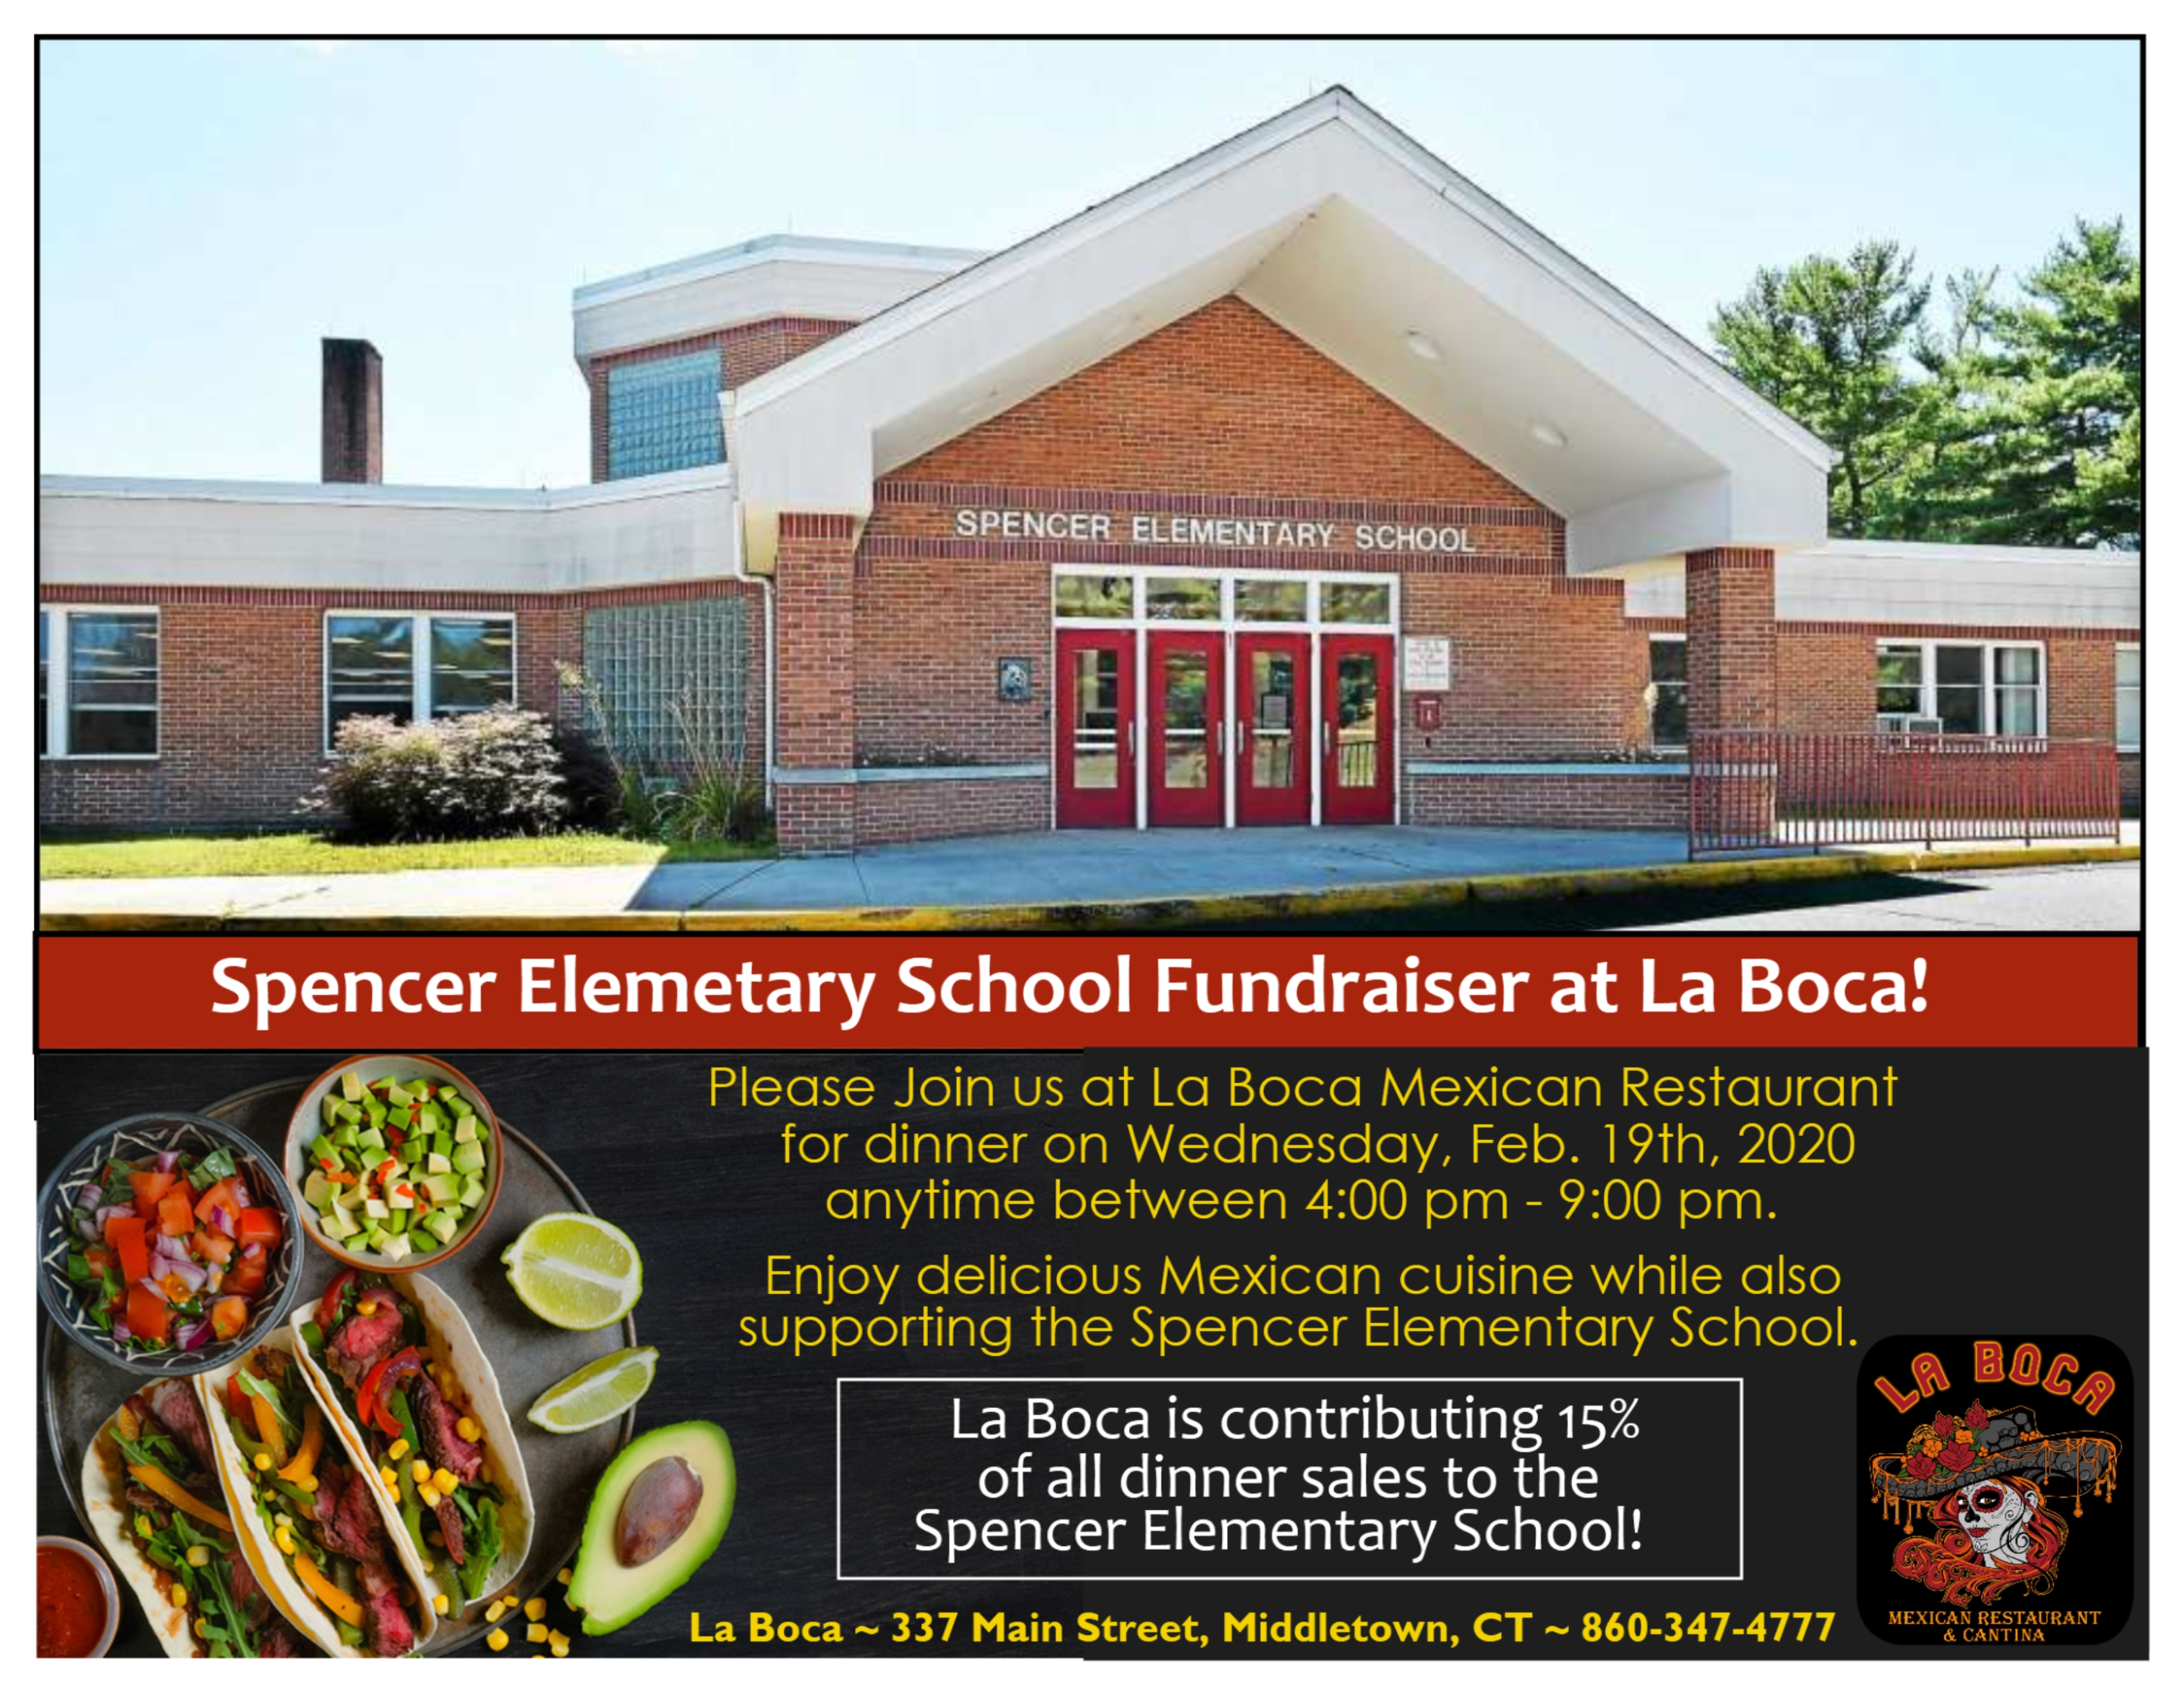 LA BOCA Spencer School Fundraiser Pic FEB-2020 (1)